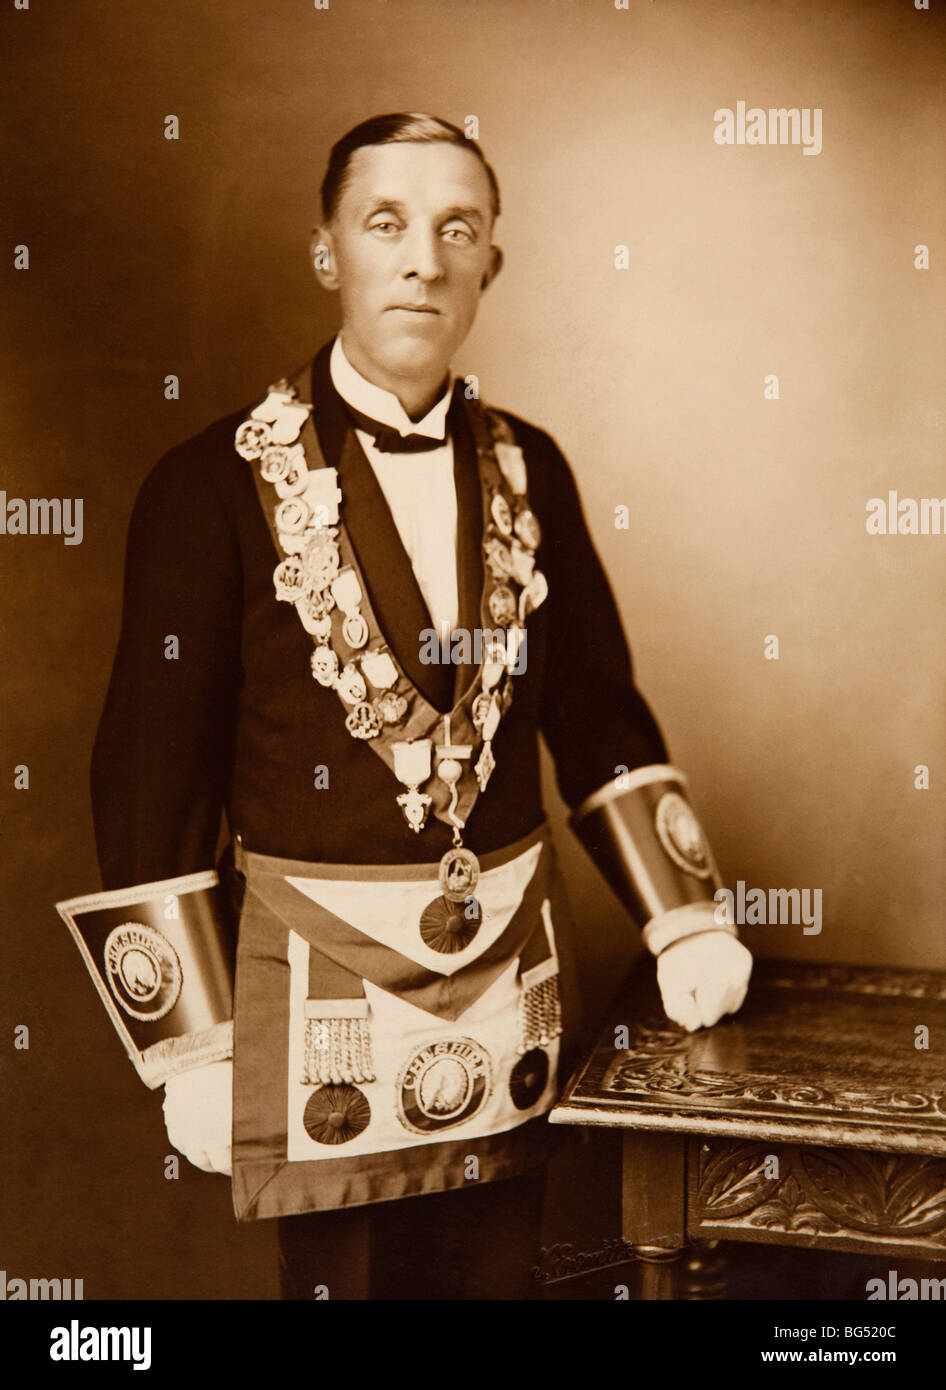 Maasonic history, man in 1920s freemasons regalia - Stock Image